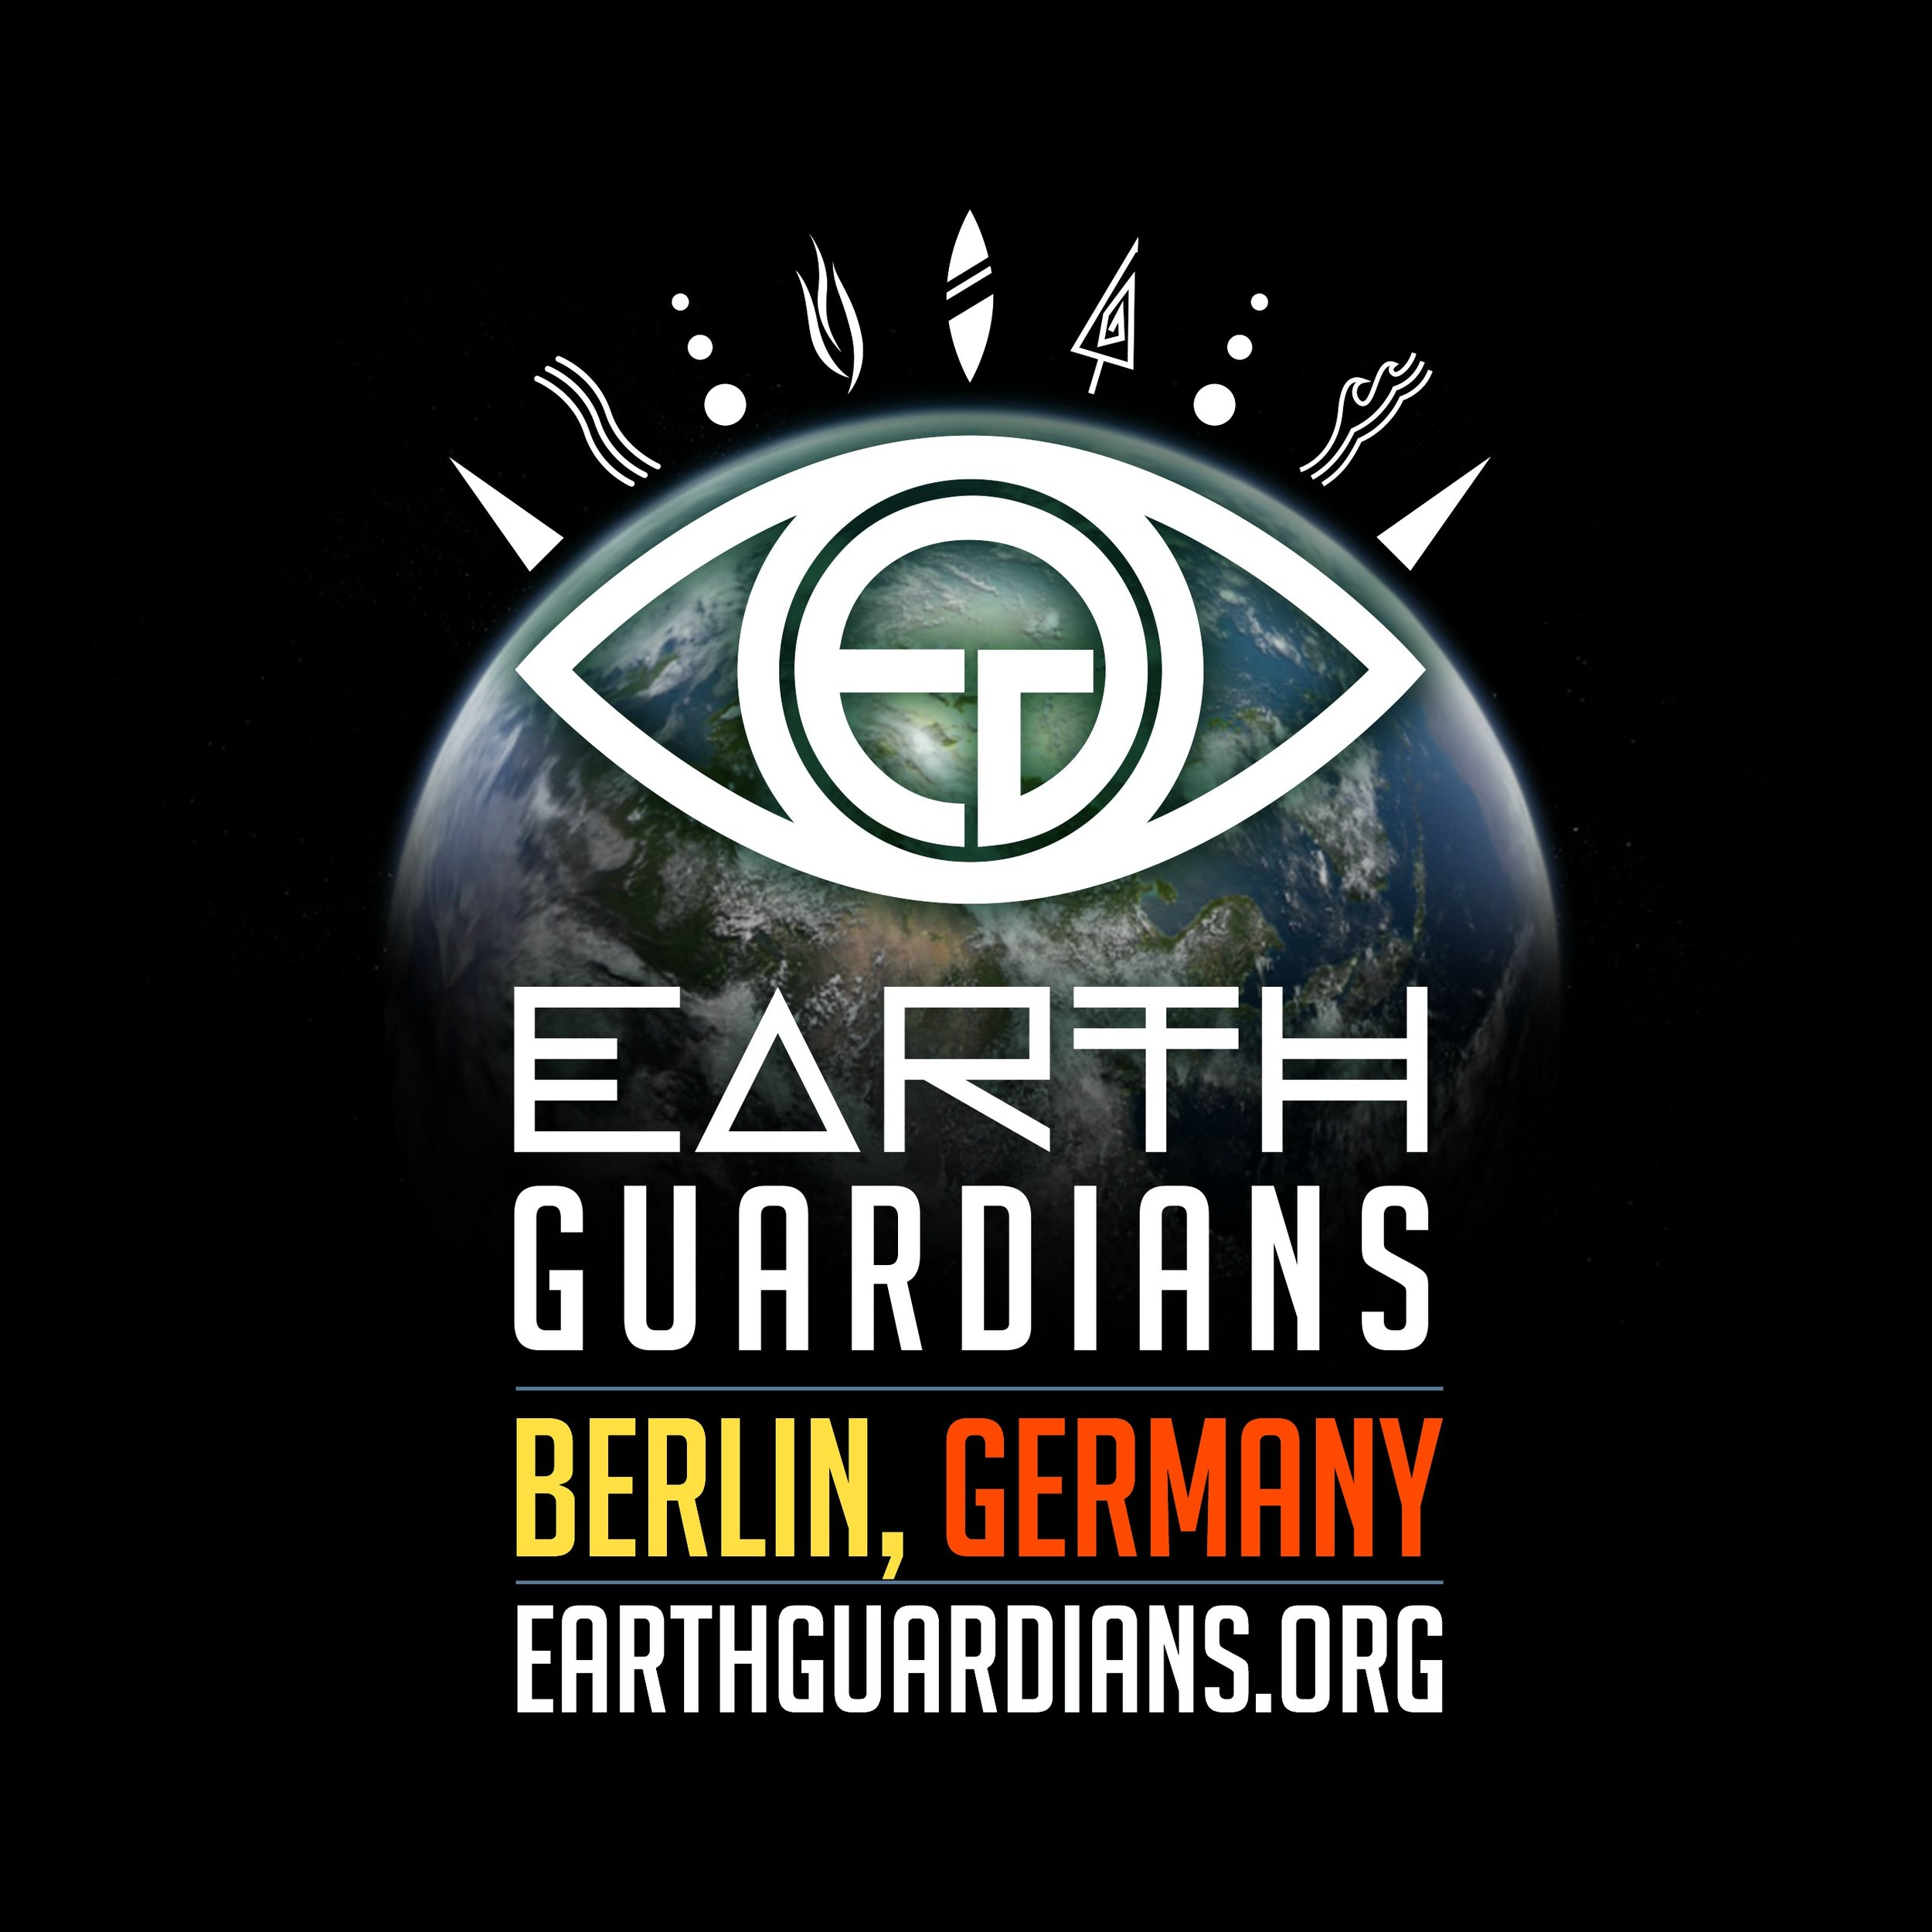 EG_crew logo template BERLIN.jpg